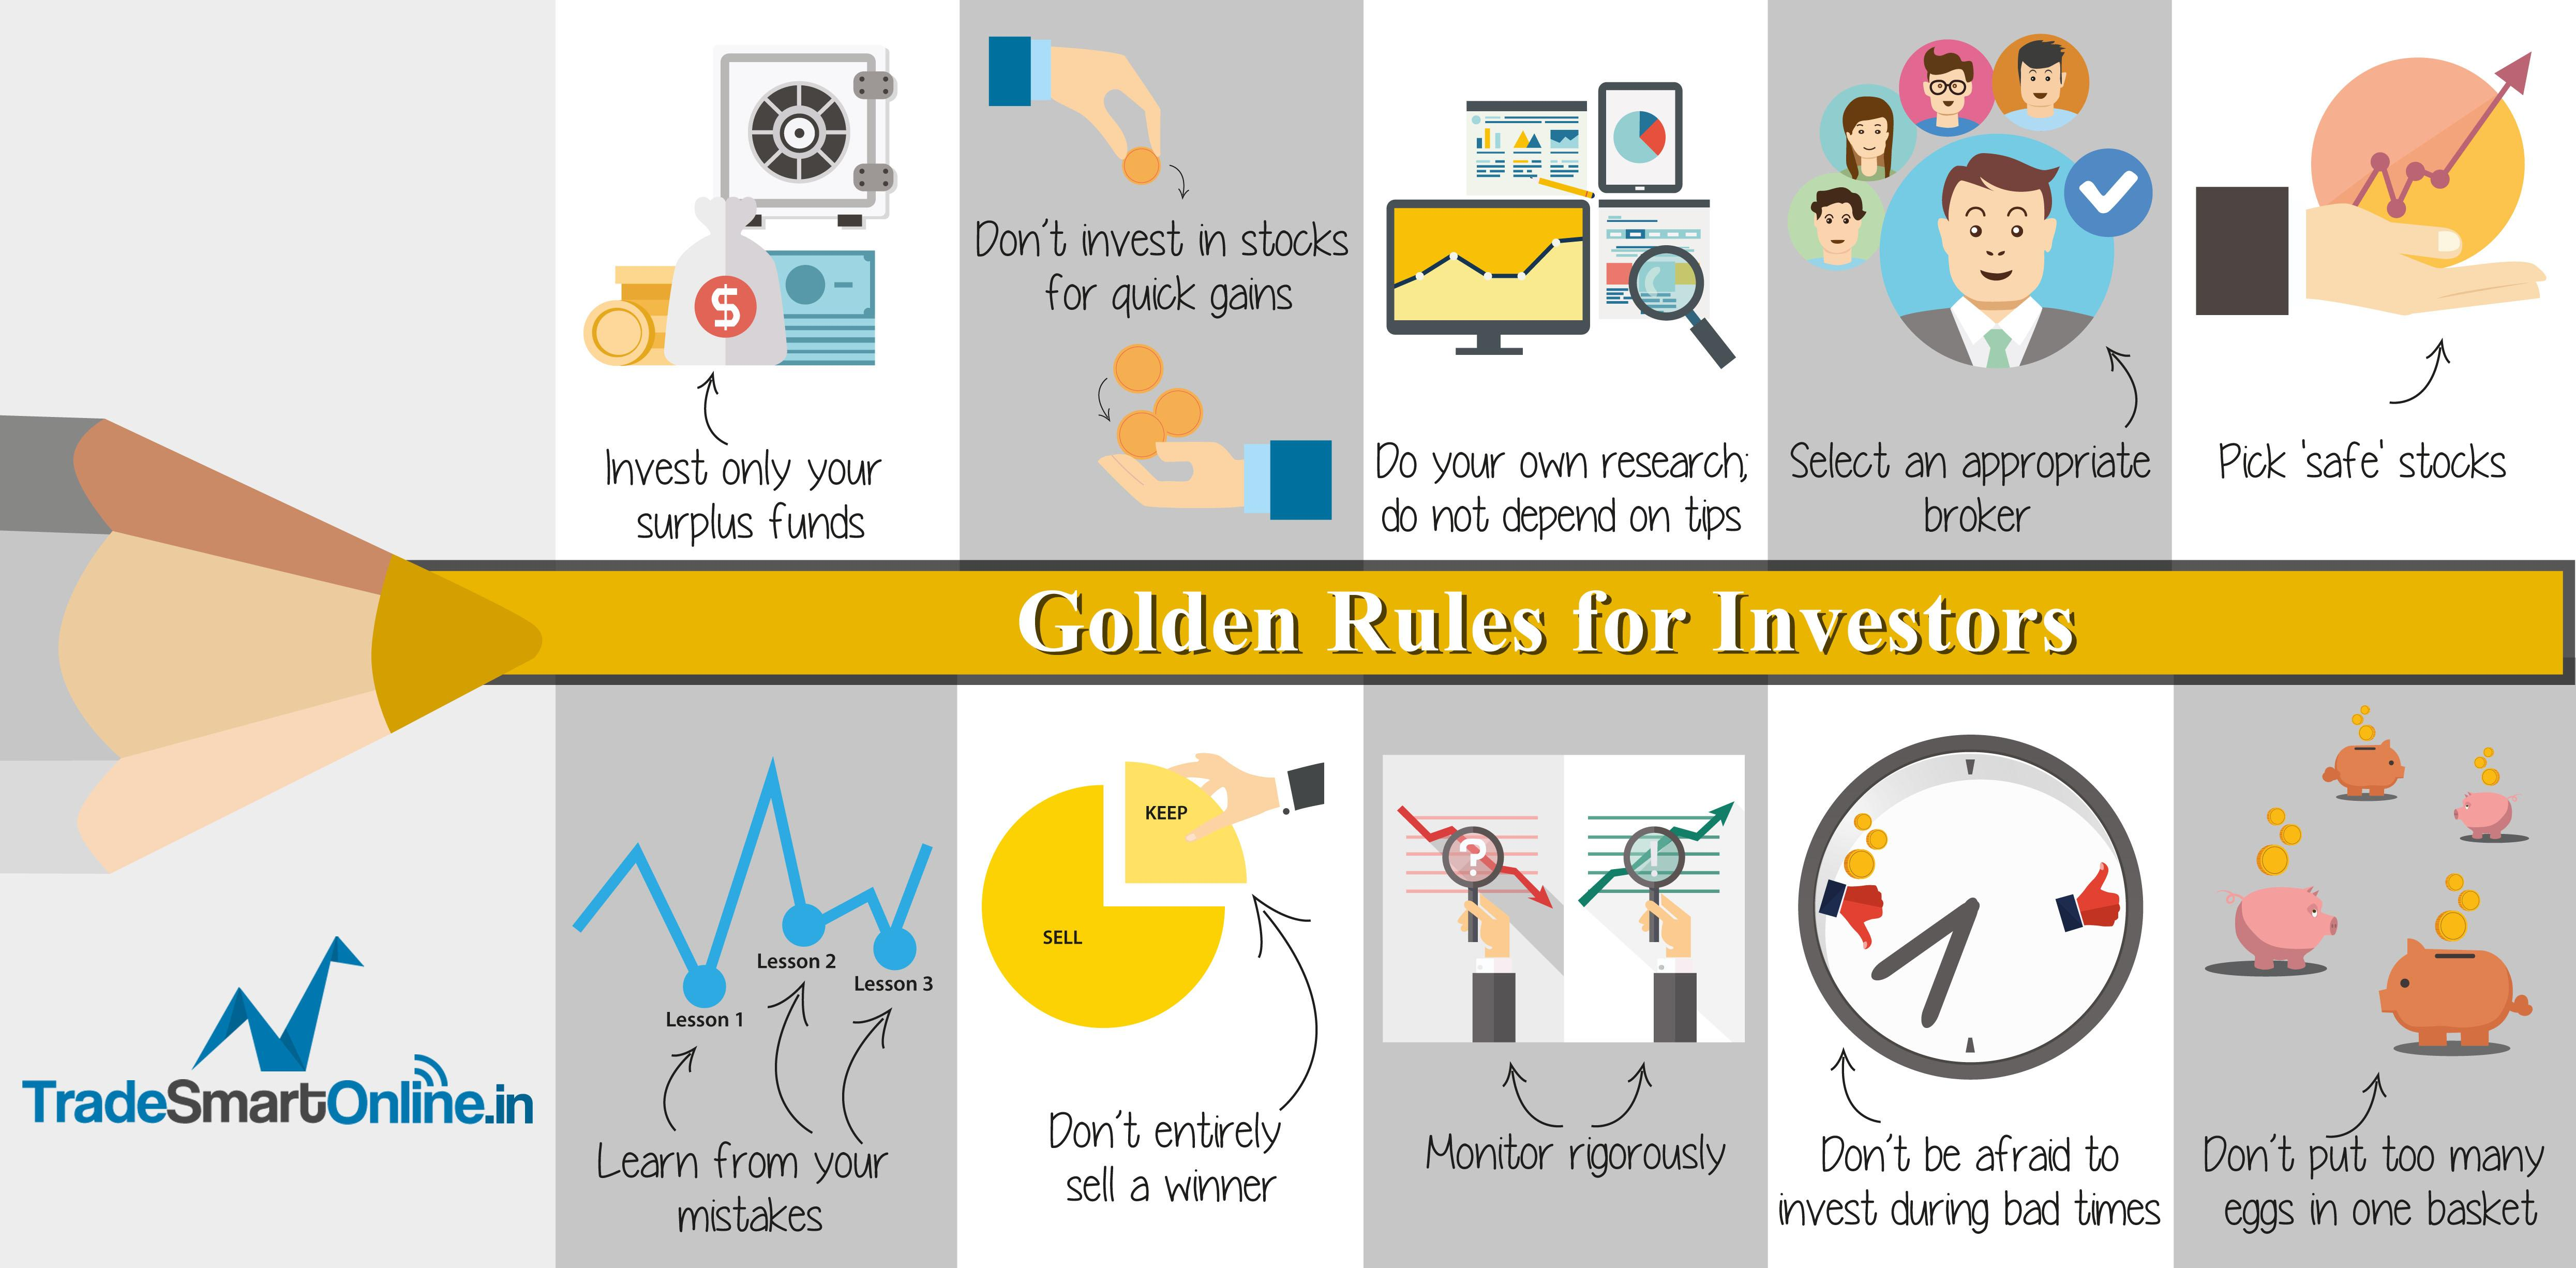 GOLDEN RULESa - Golden Rules of Investment